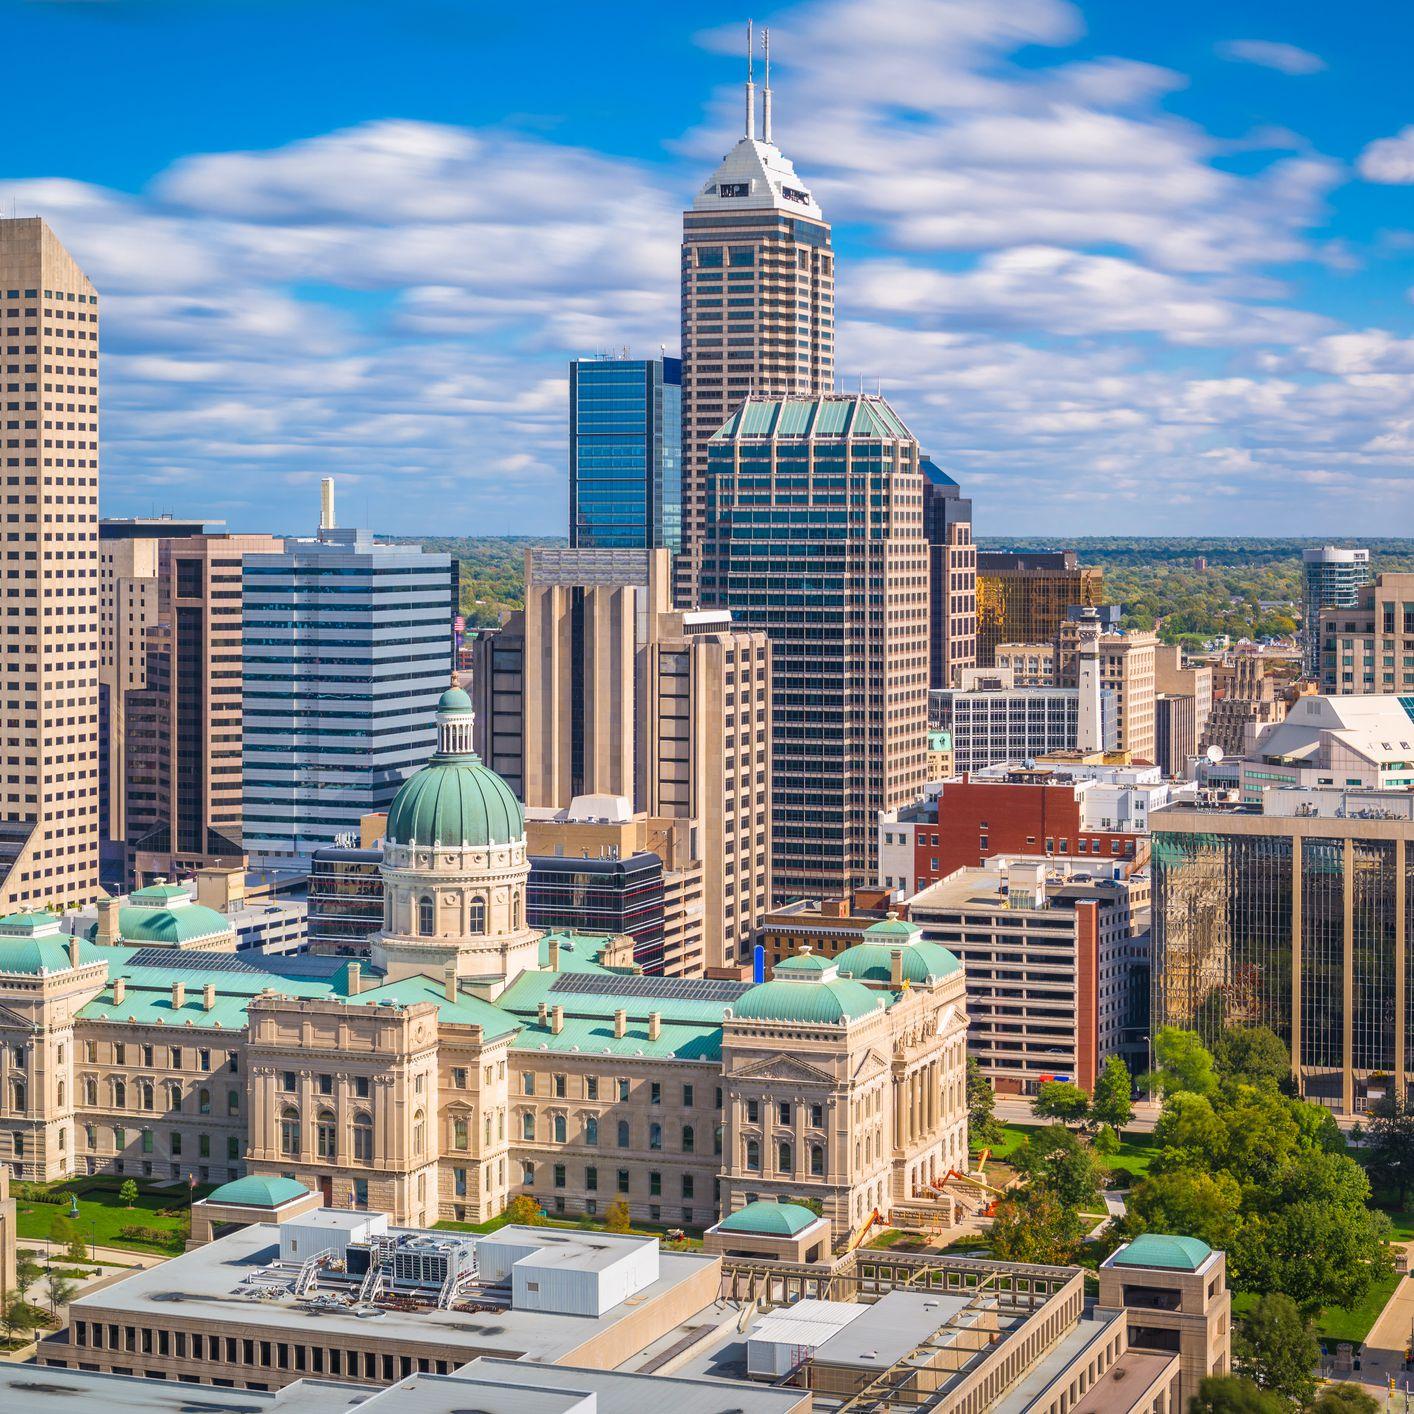 The Top 10 Neighborhoods in Indianapolis